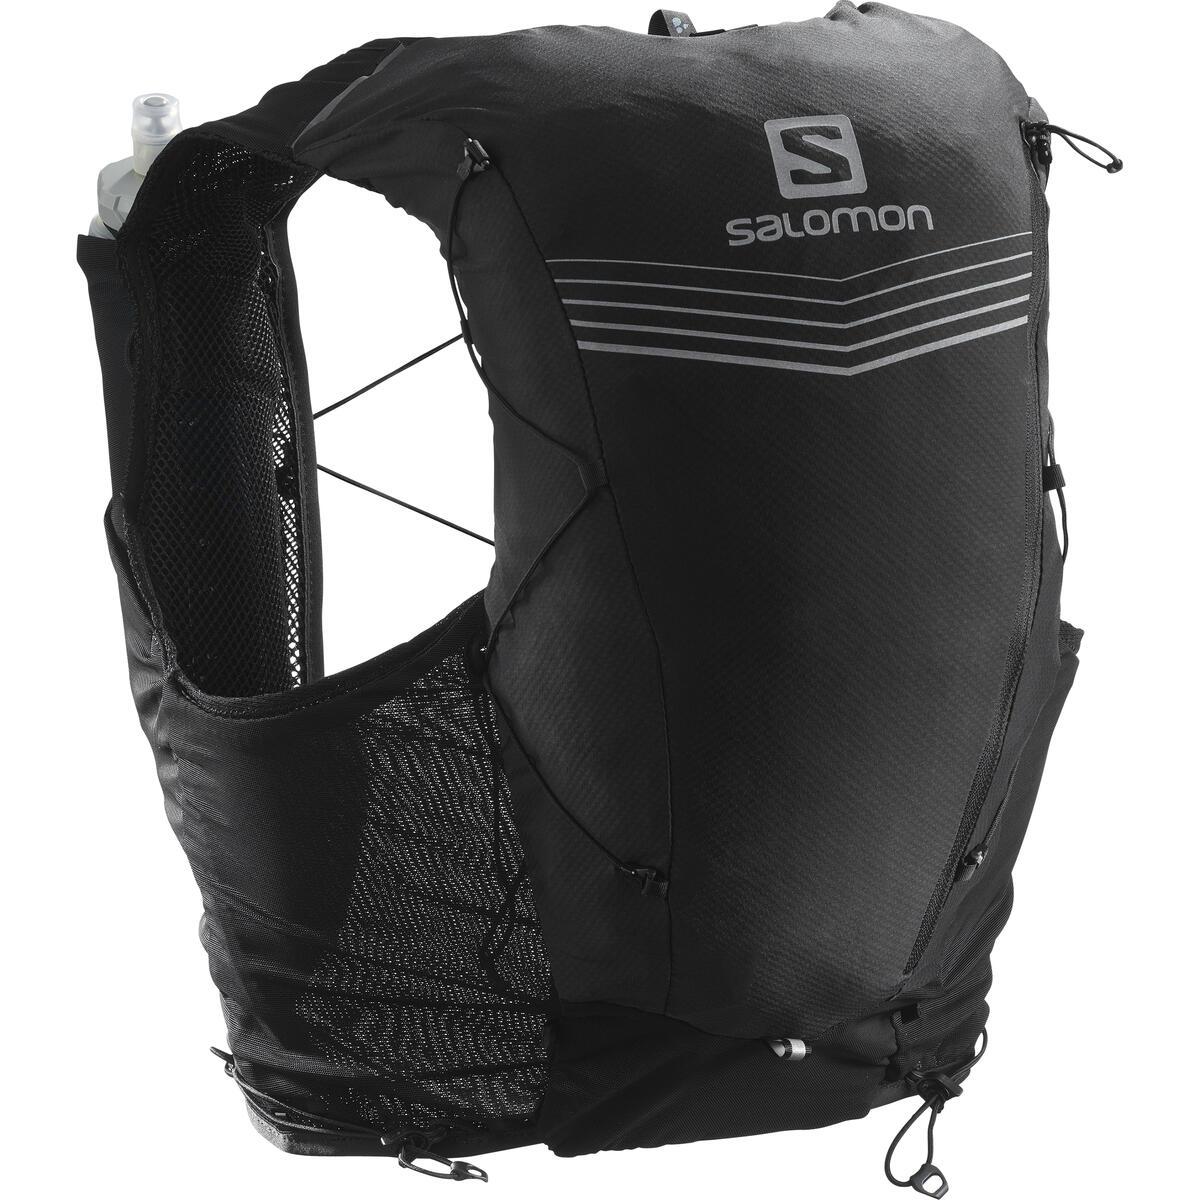 Salomon Advanced Skin 12 Set - Laufrucksack